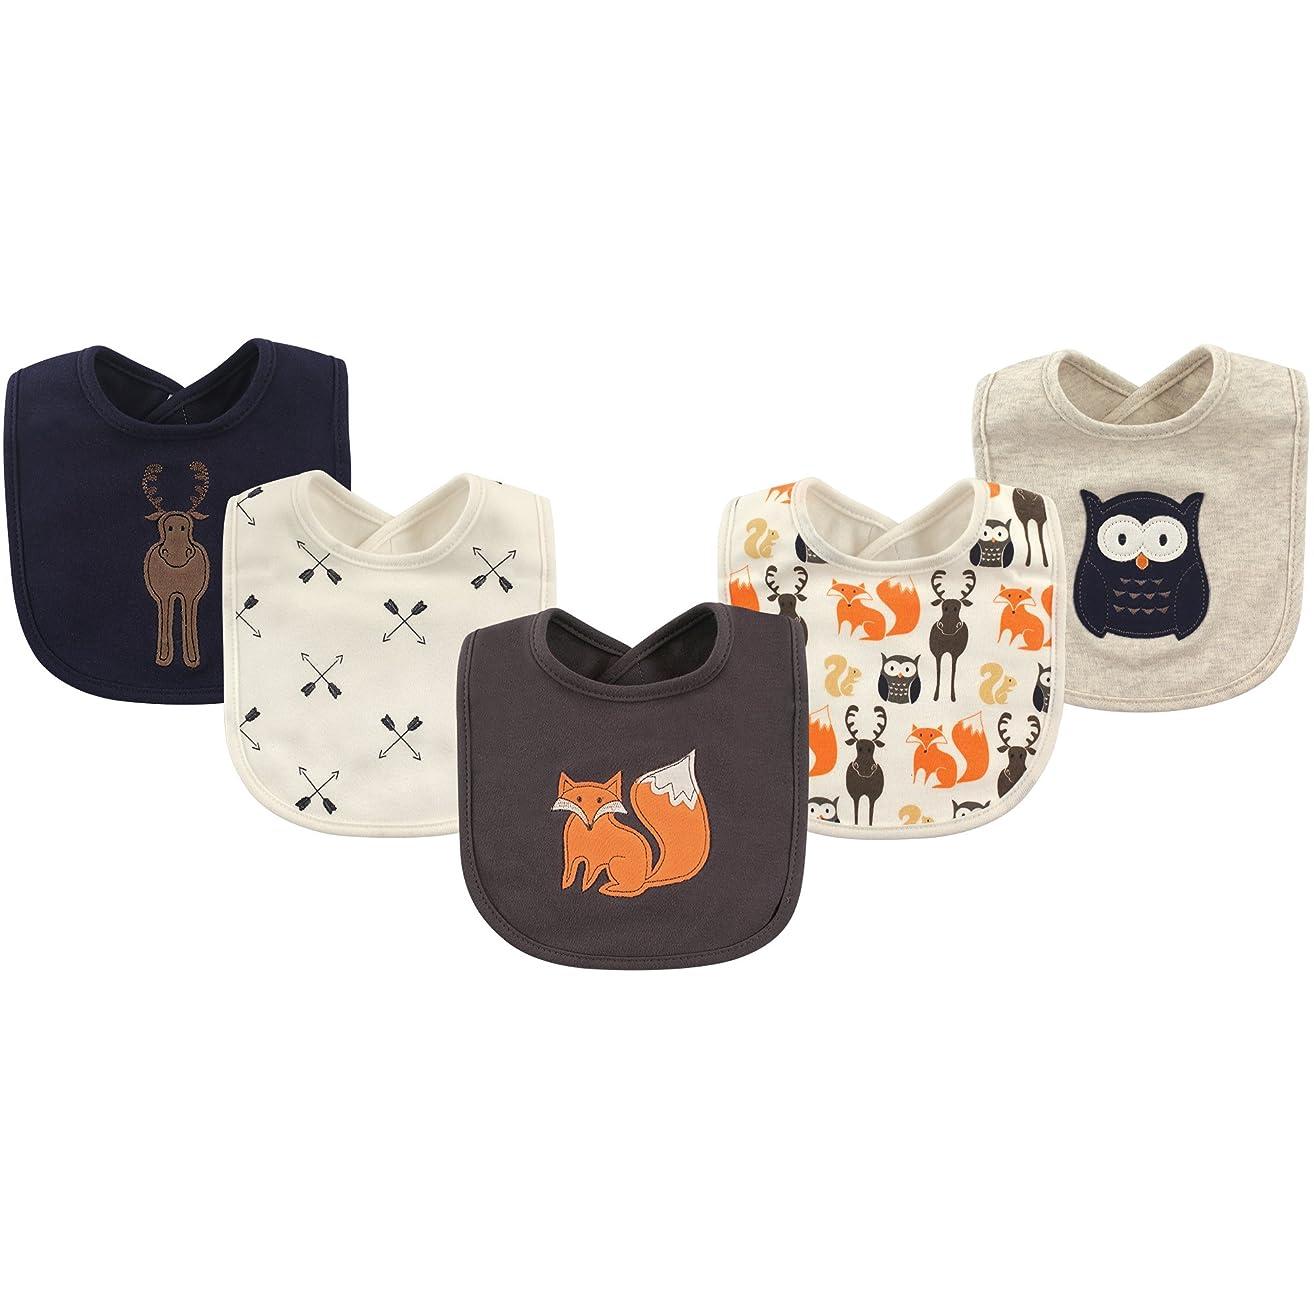 Hudson Baby Baby Girls' Cotton Drooler Bib, 5 Pack